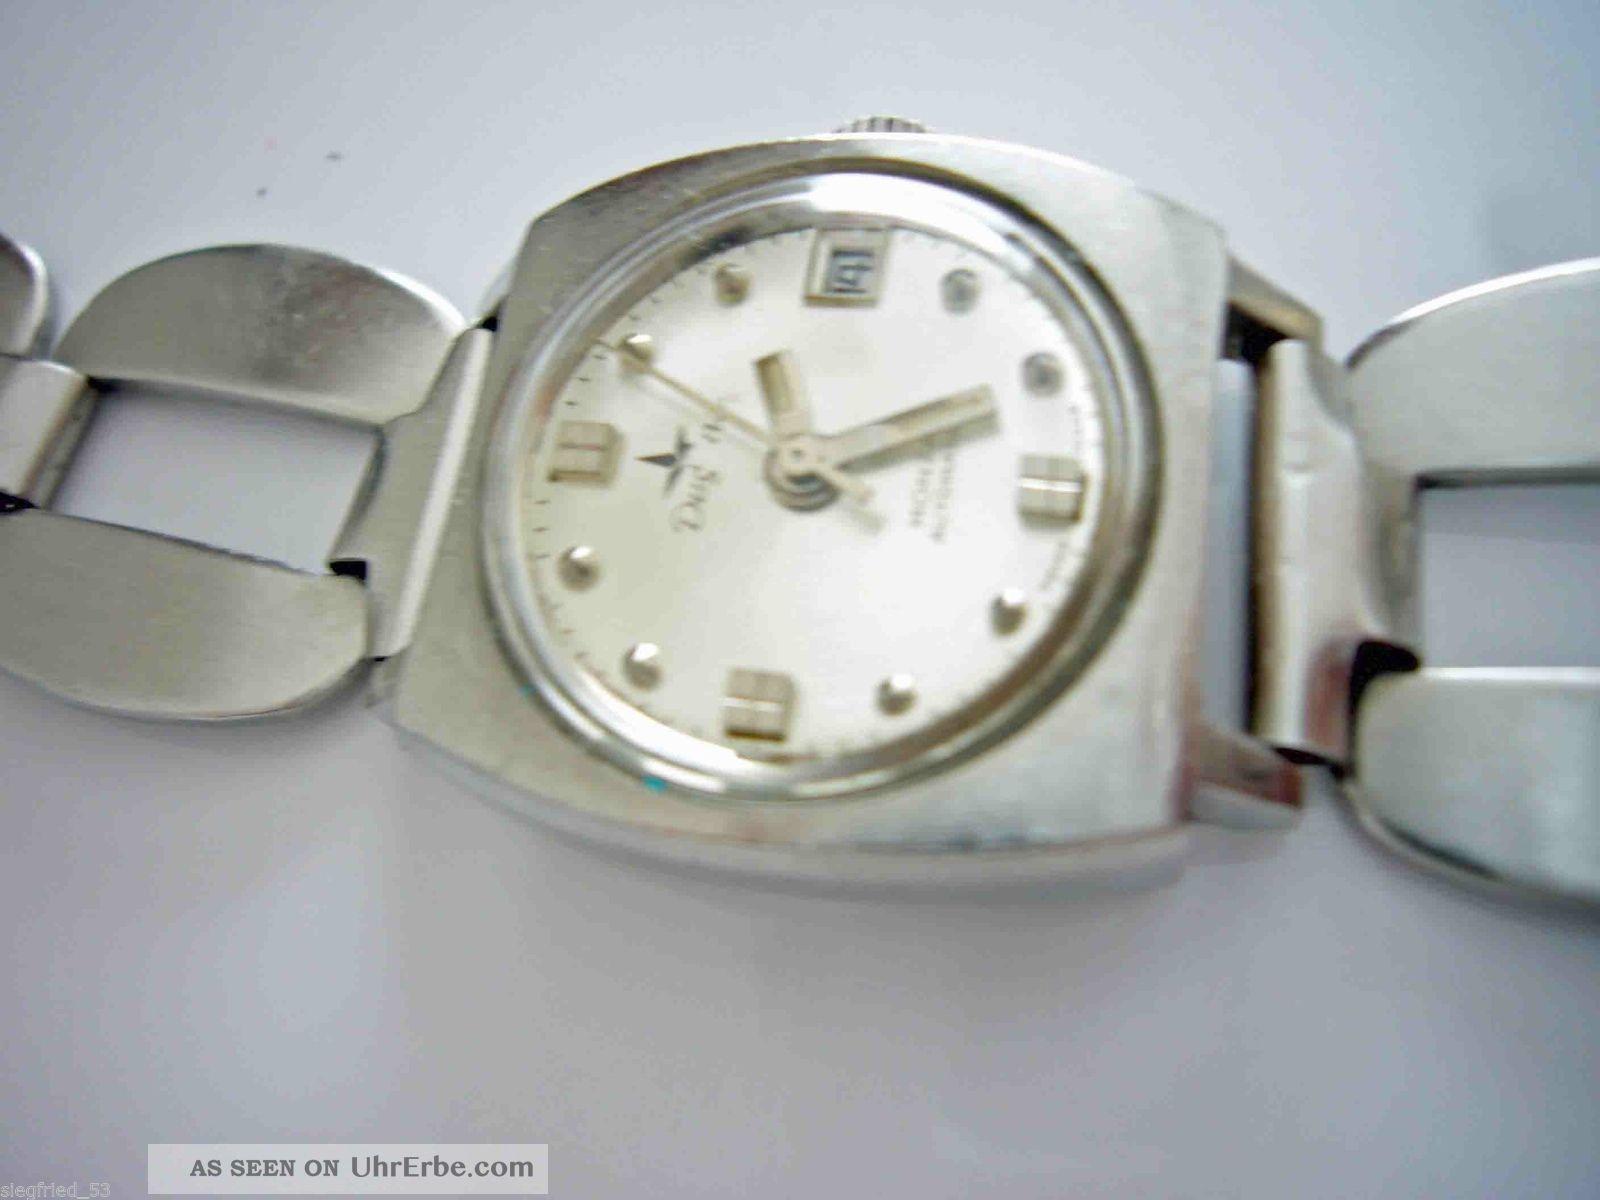 Dugena Monza Automatic Swiss Made Mit Datum Damenuhr Armbanduhren Bild